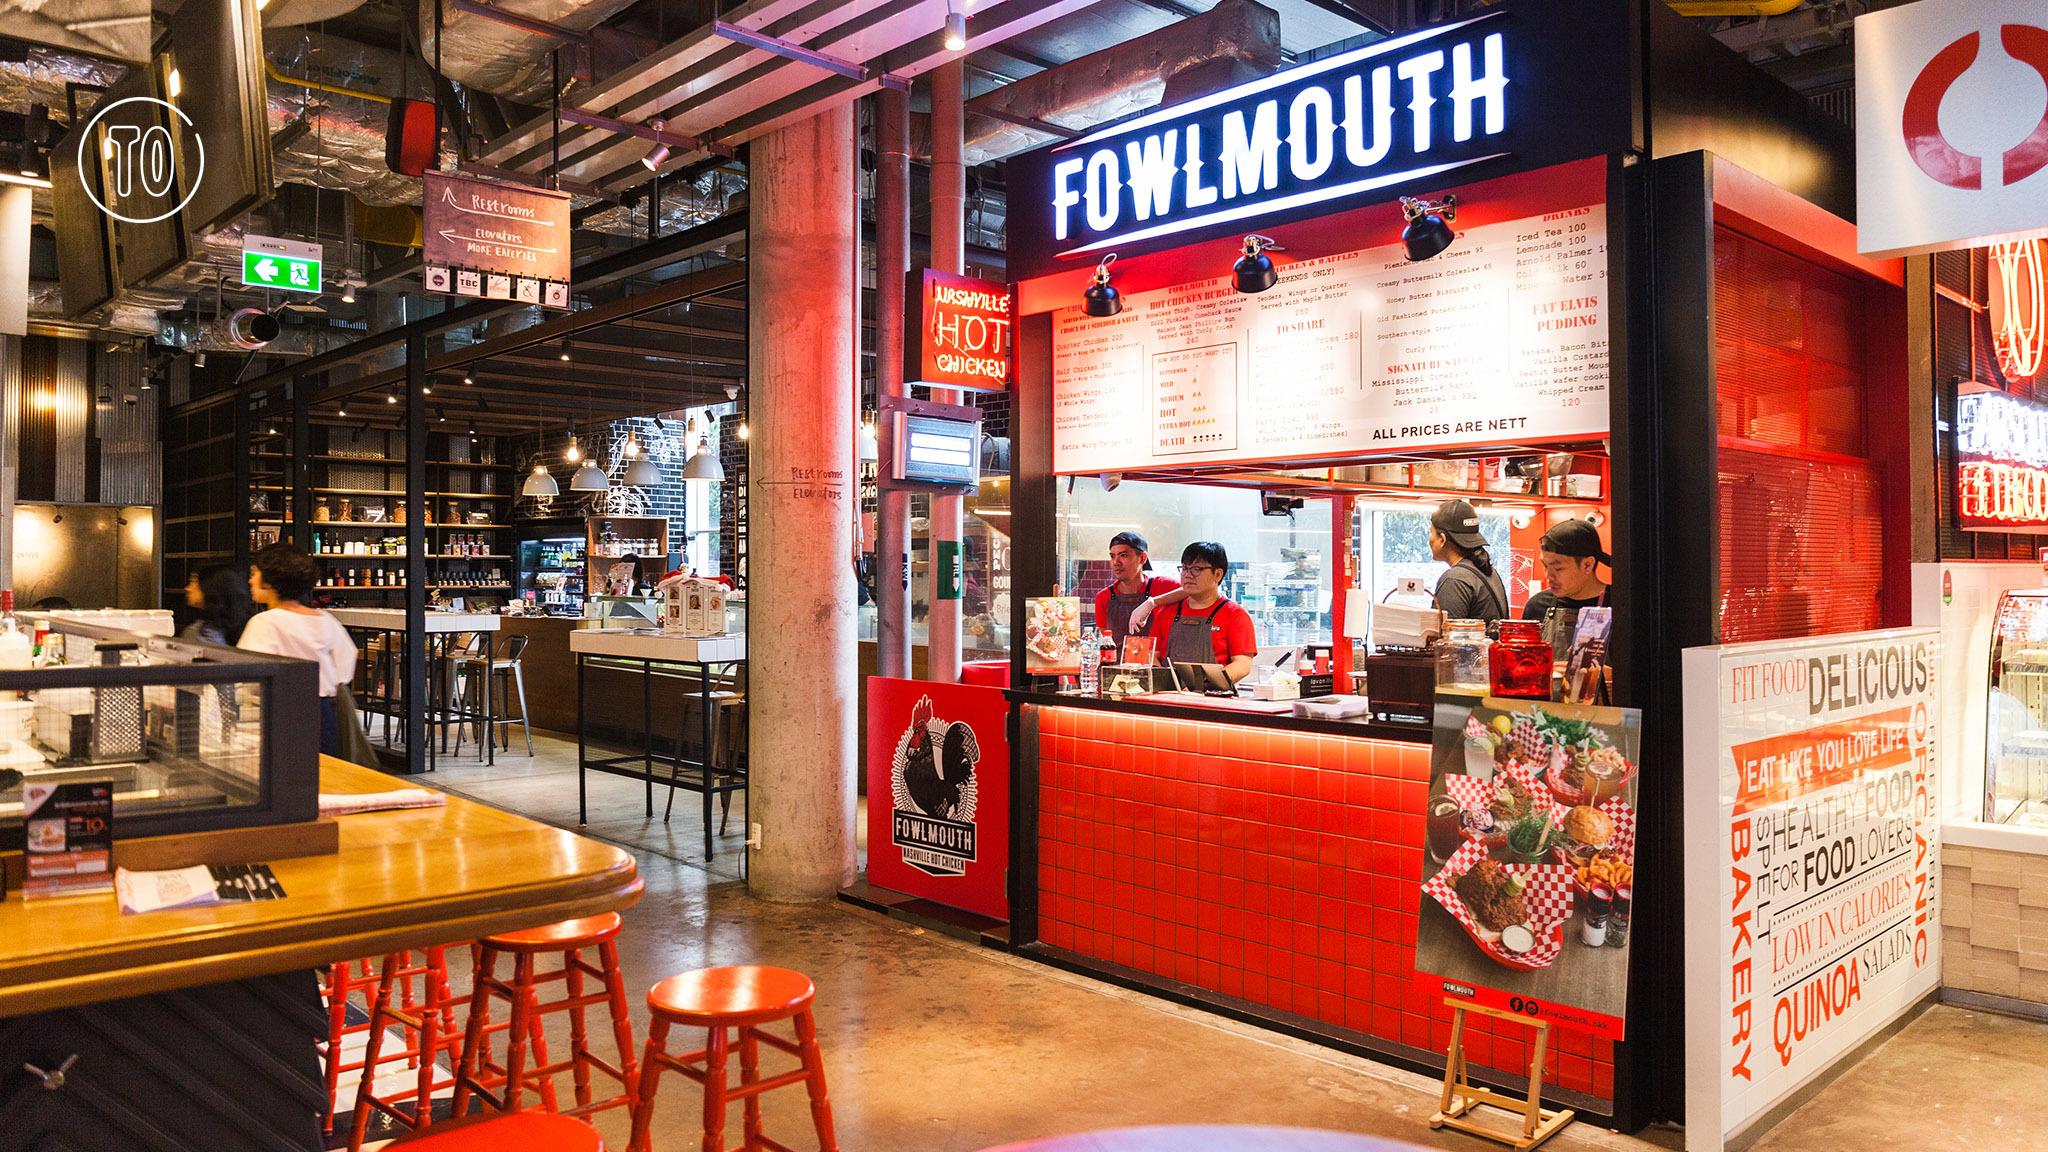 Fowlmouth